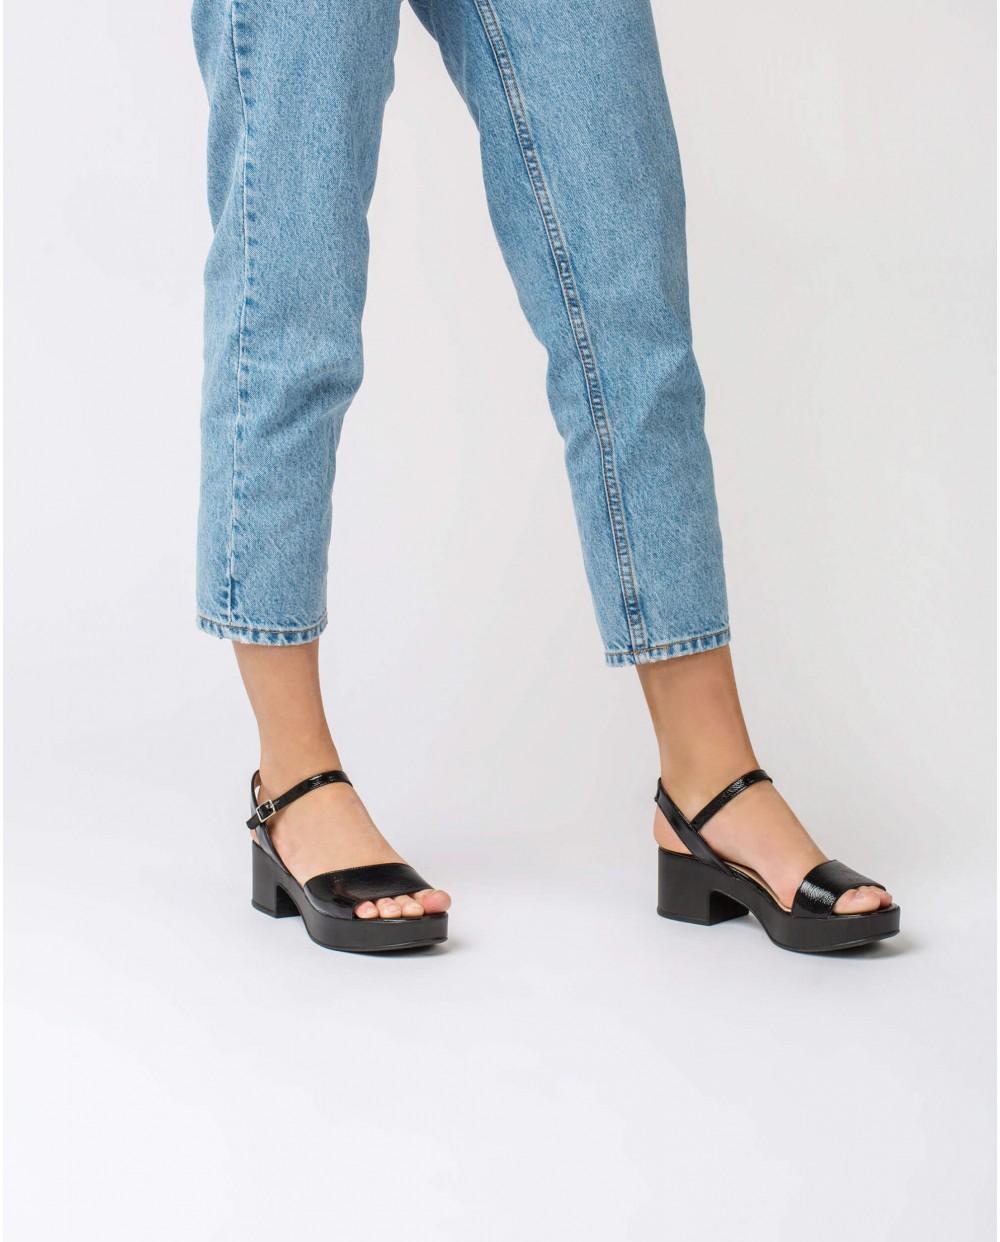 Wonders-Sandals-Leather wedge sandal